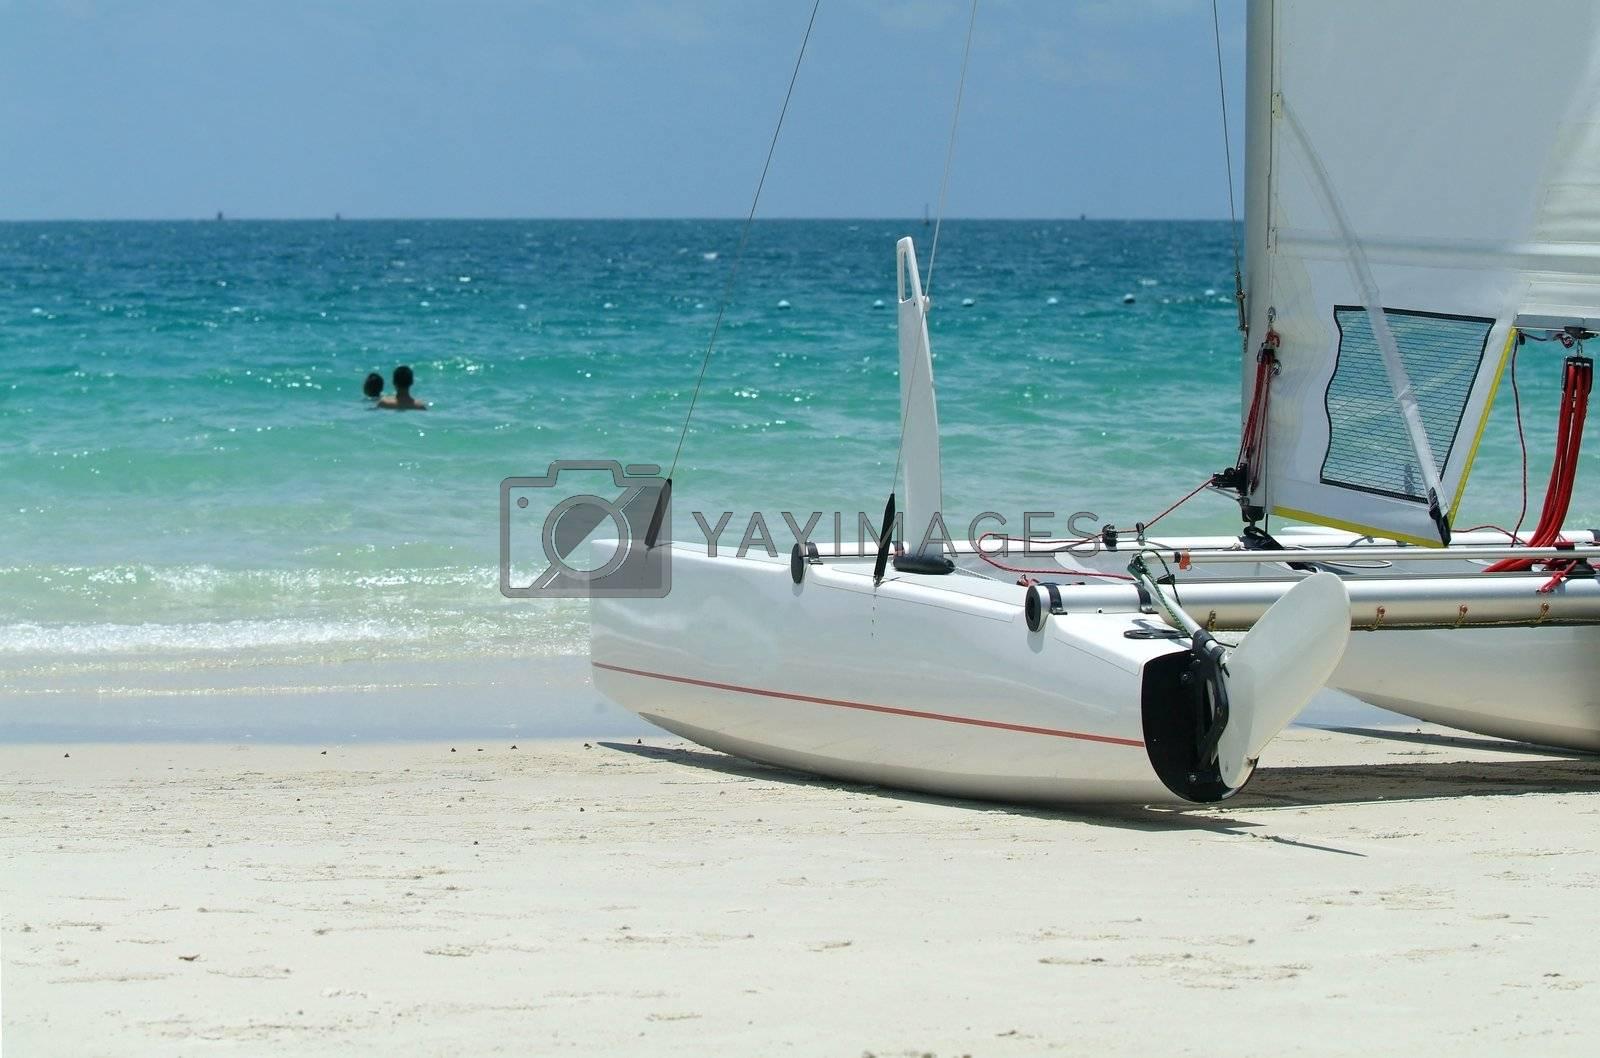 Catamaran on the beach by epixx